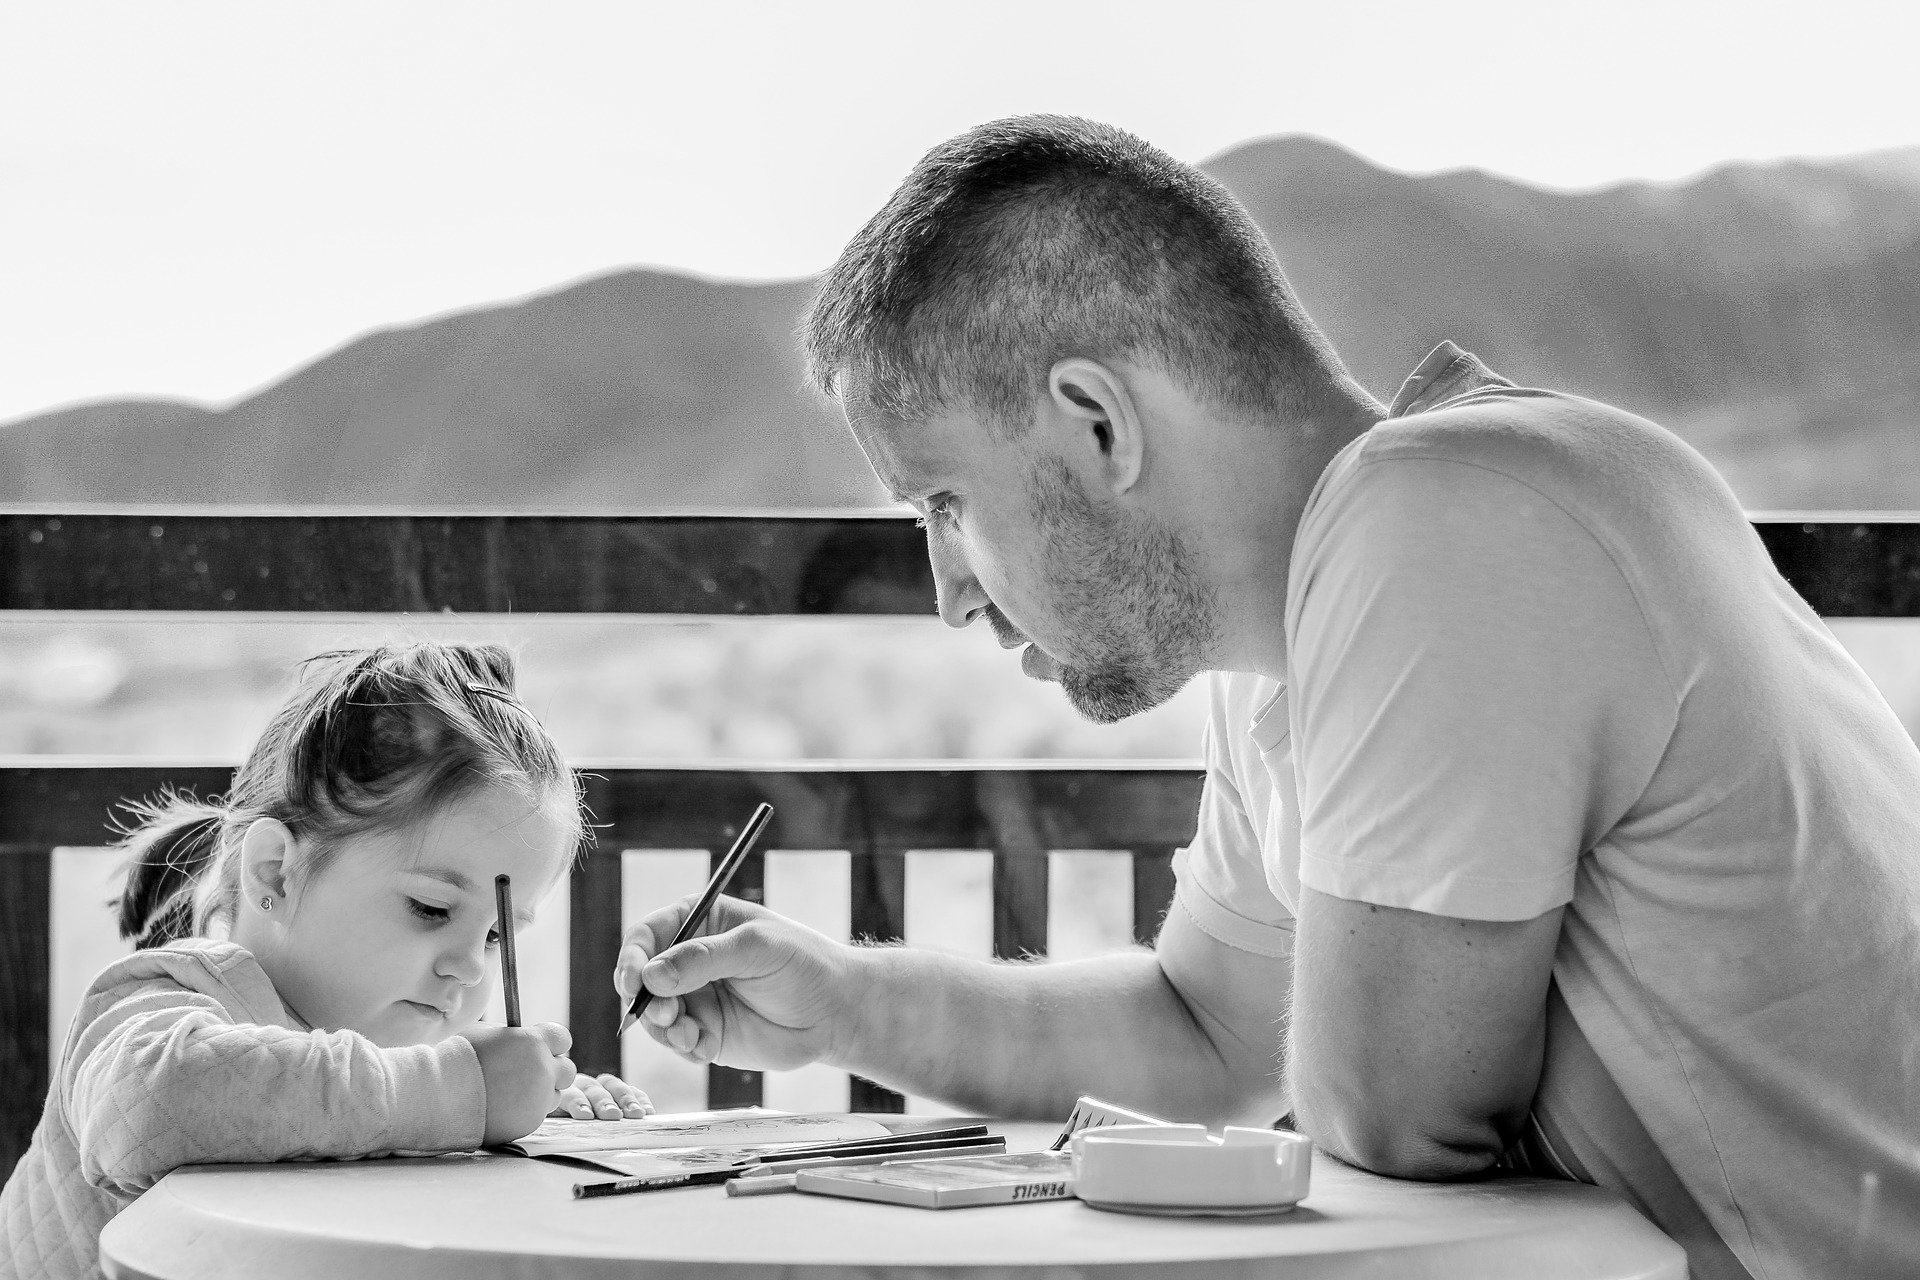 Source: https://pixabay.com/photos/girl-father-portrait-family-1641215/